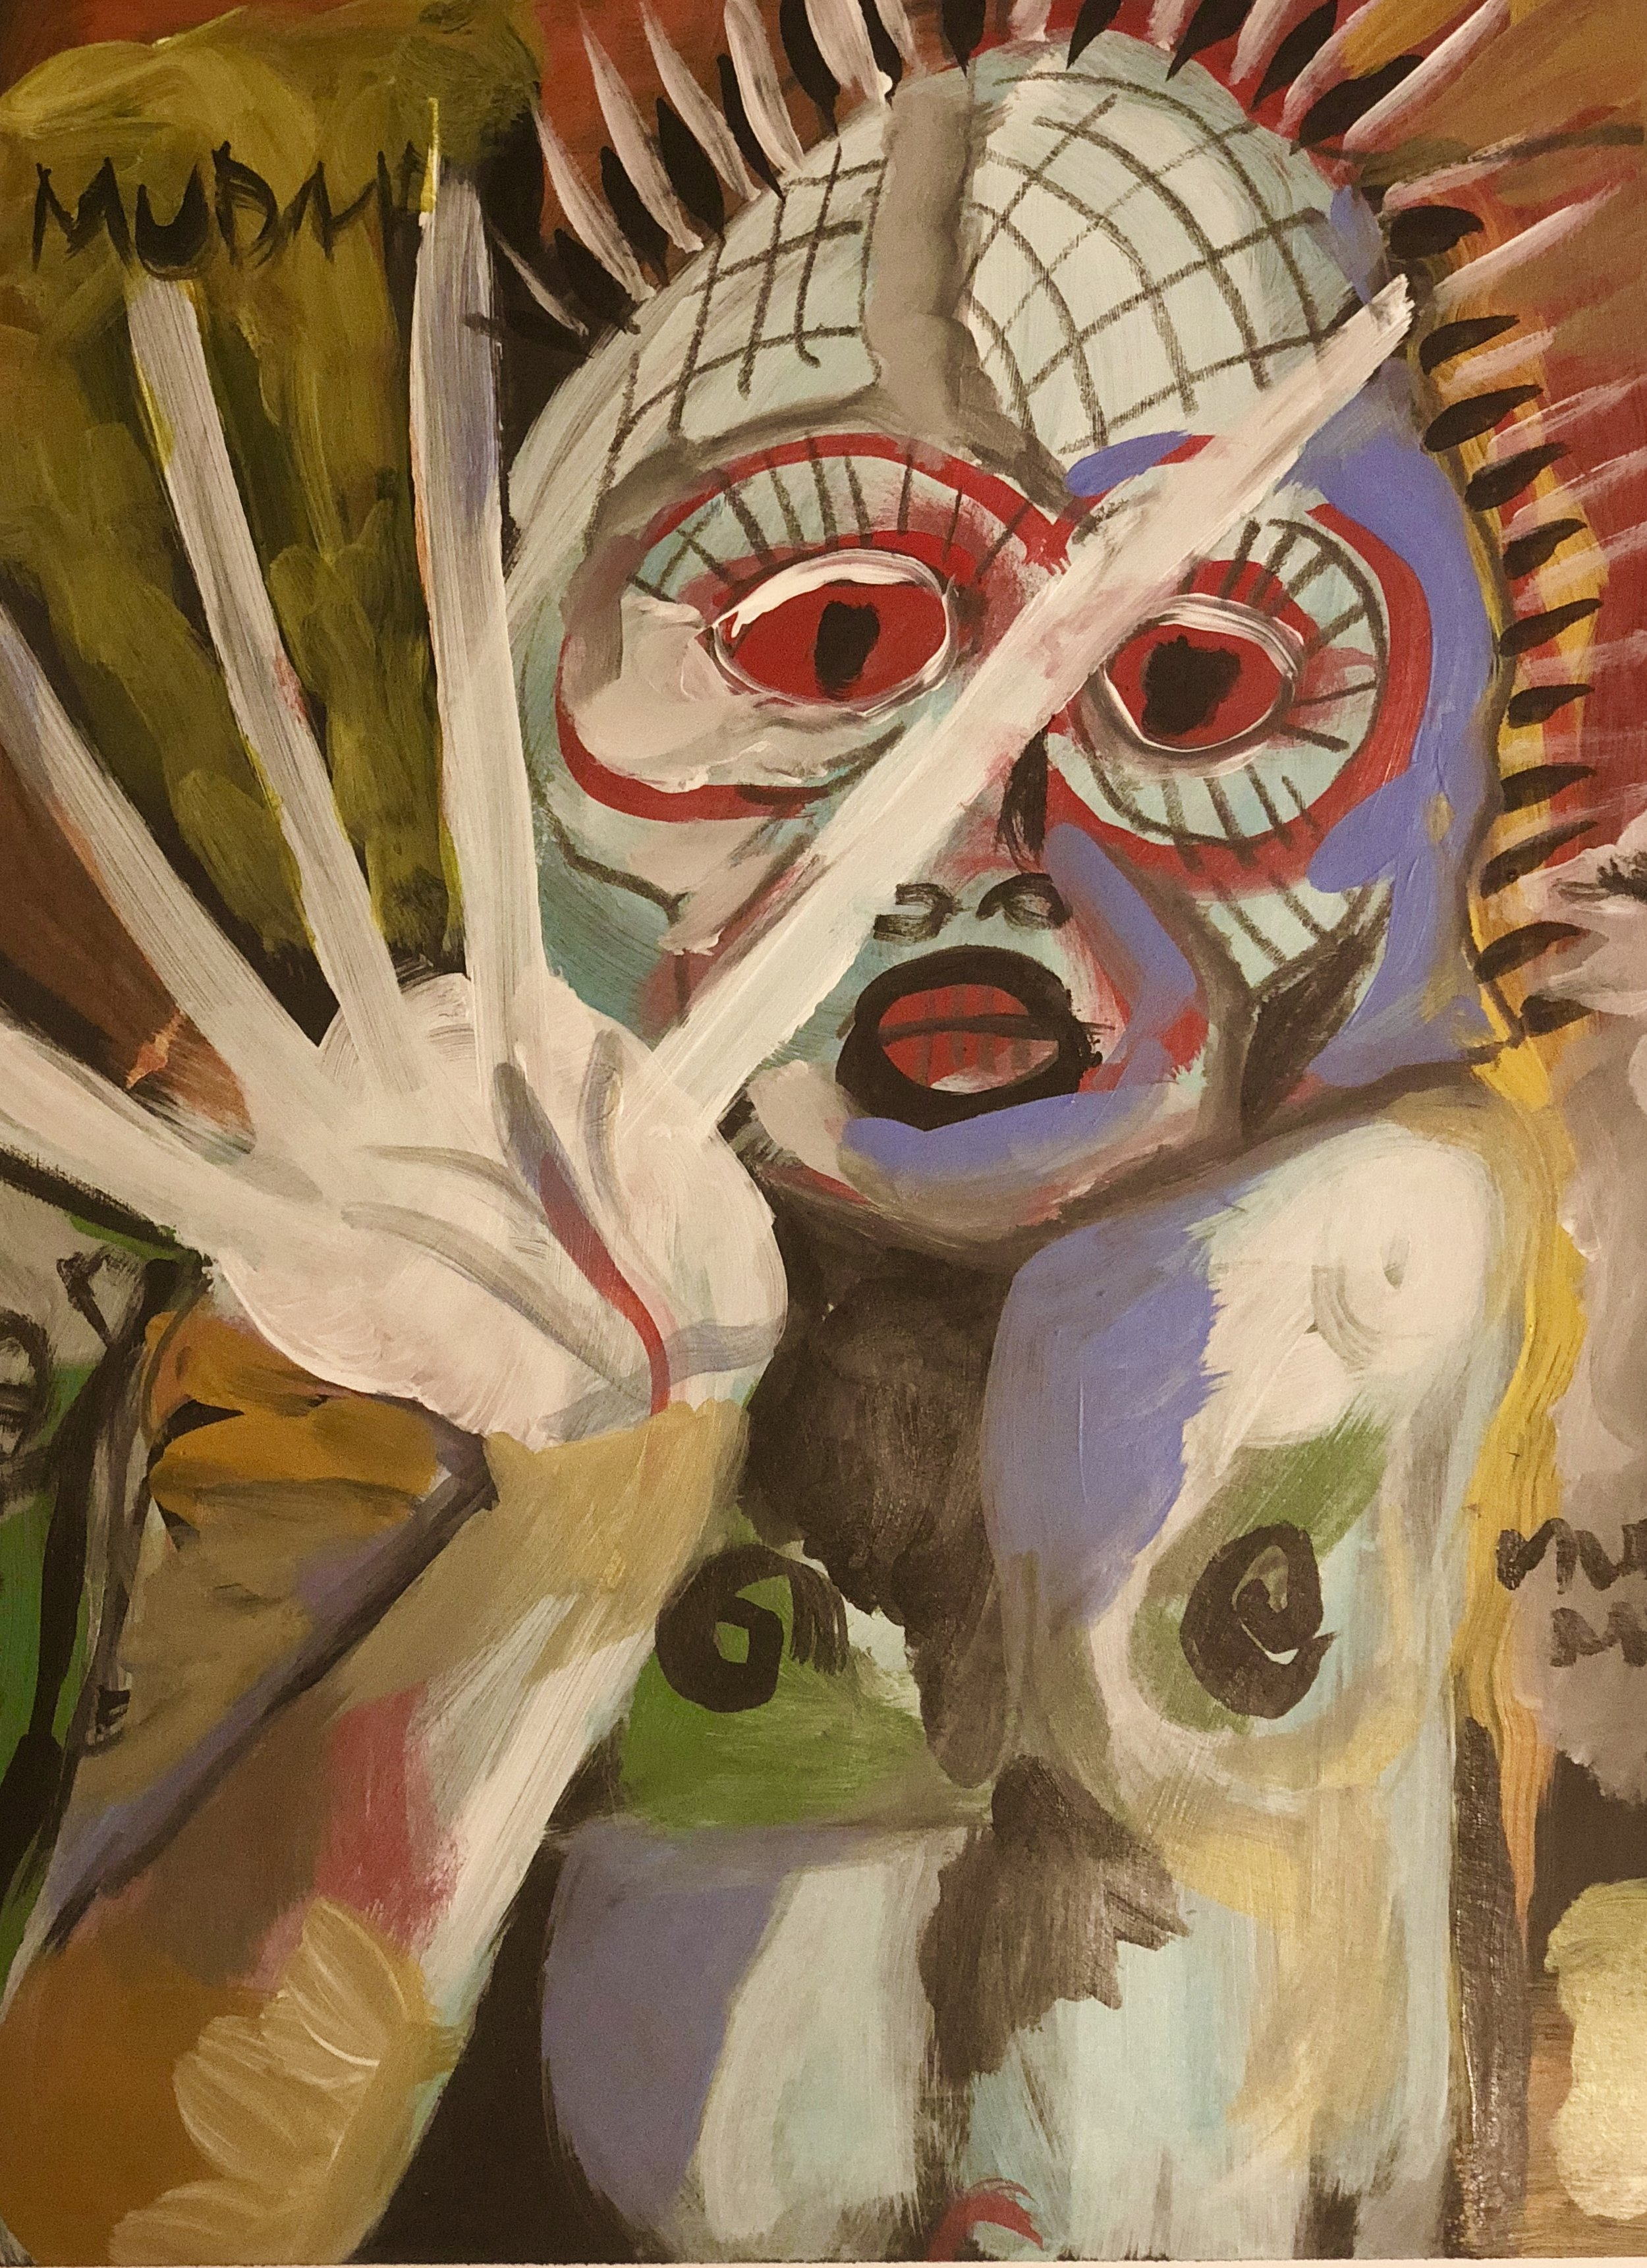 Mudman   Acrylic on paper  16 x 24   $225